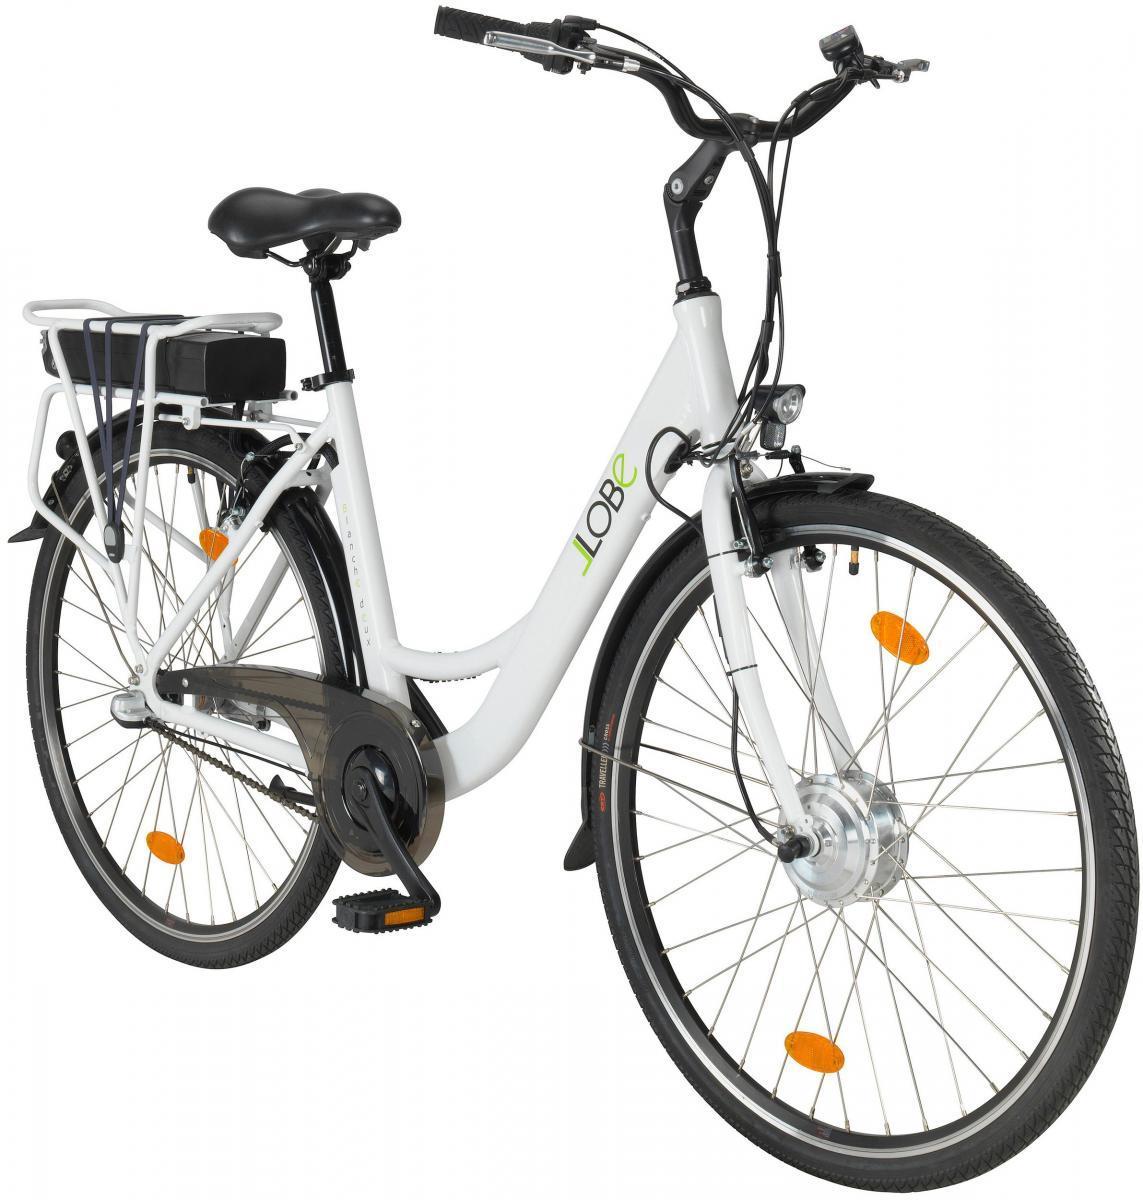 Bild 1 von LLobe City-E-Bike Blanche Deux